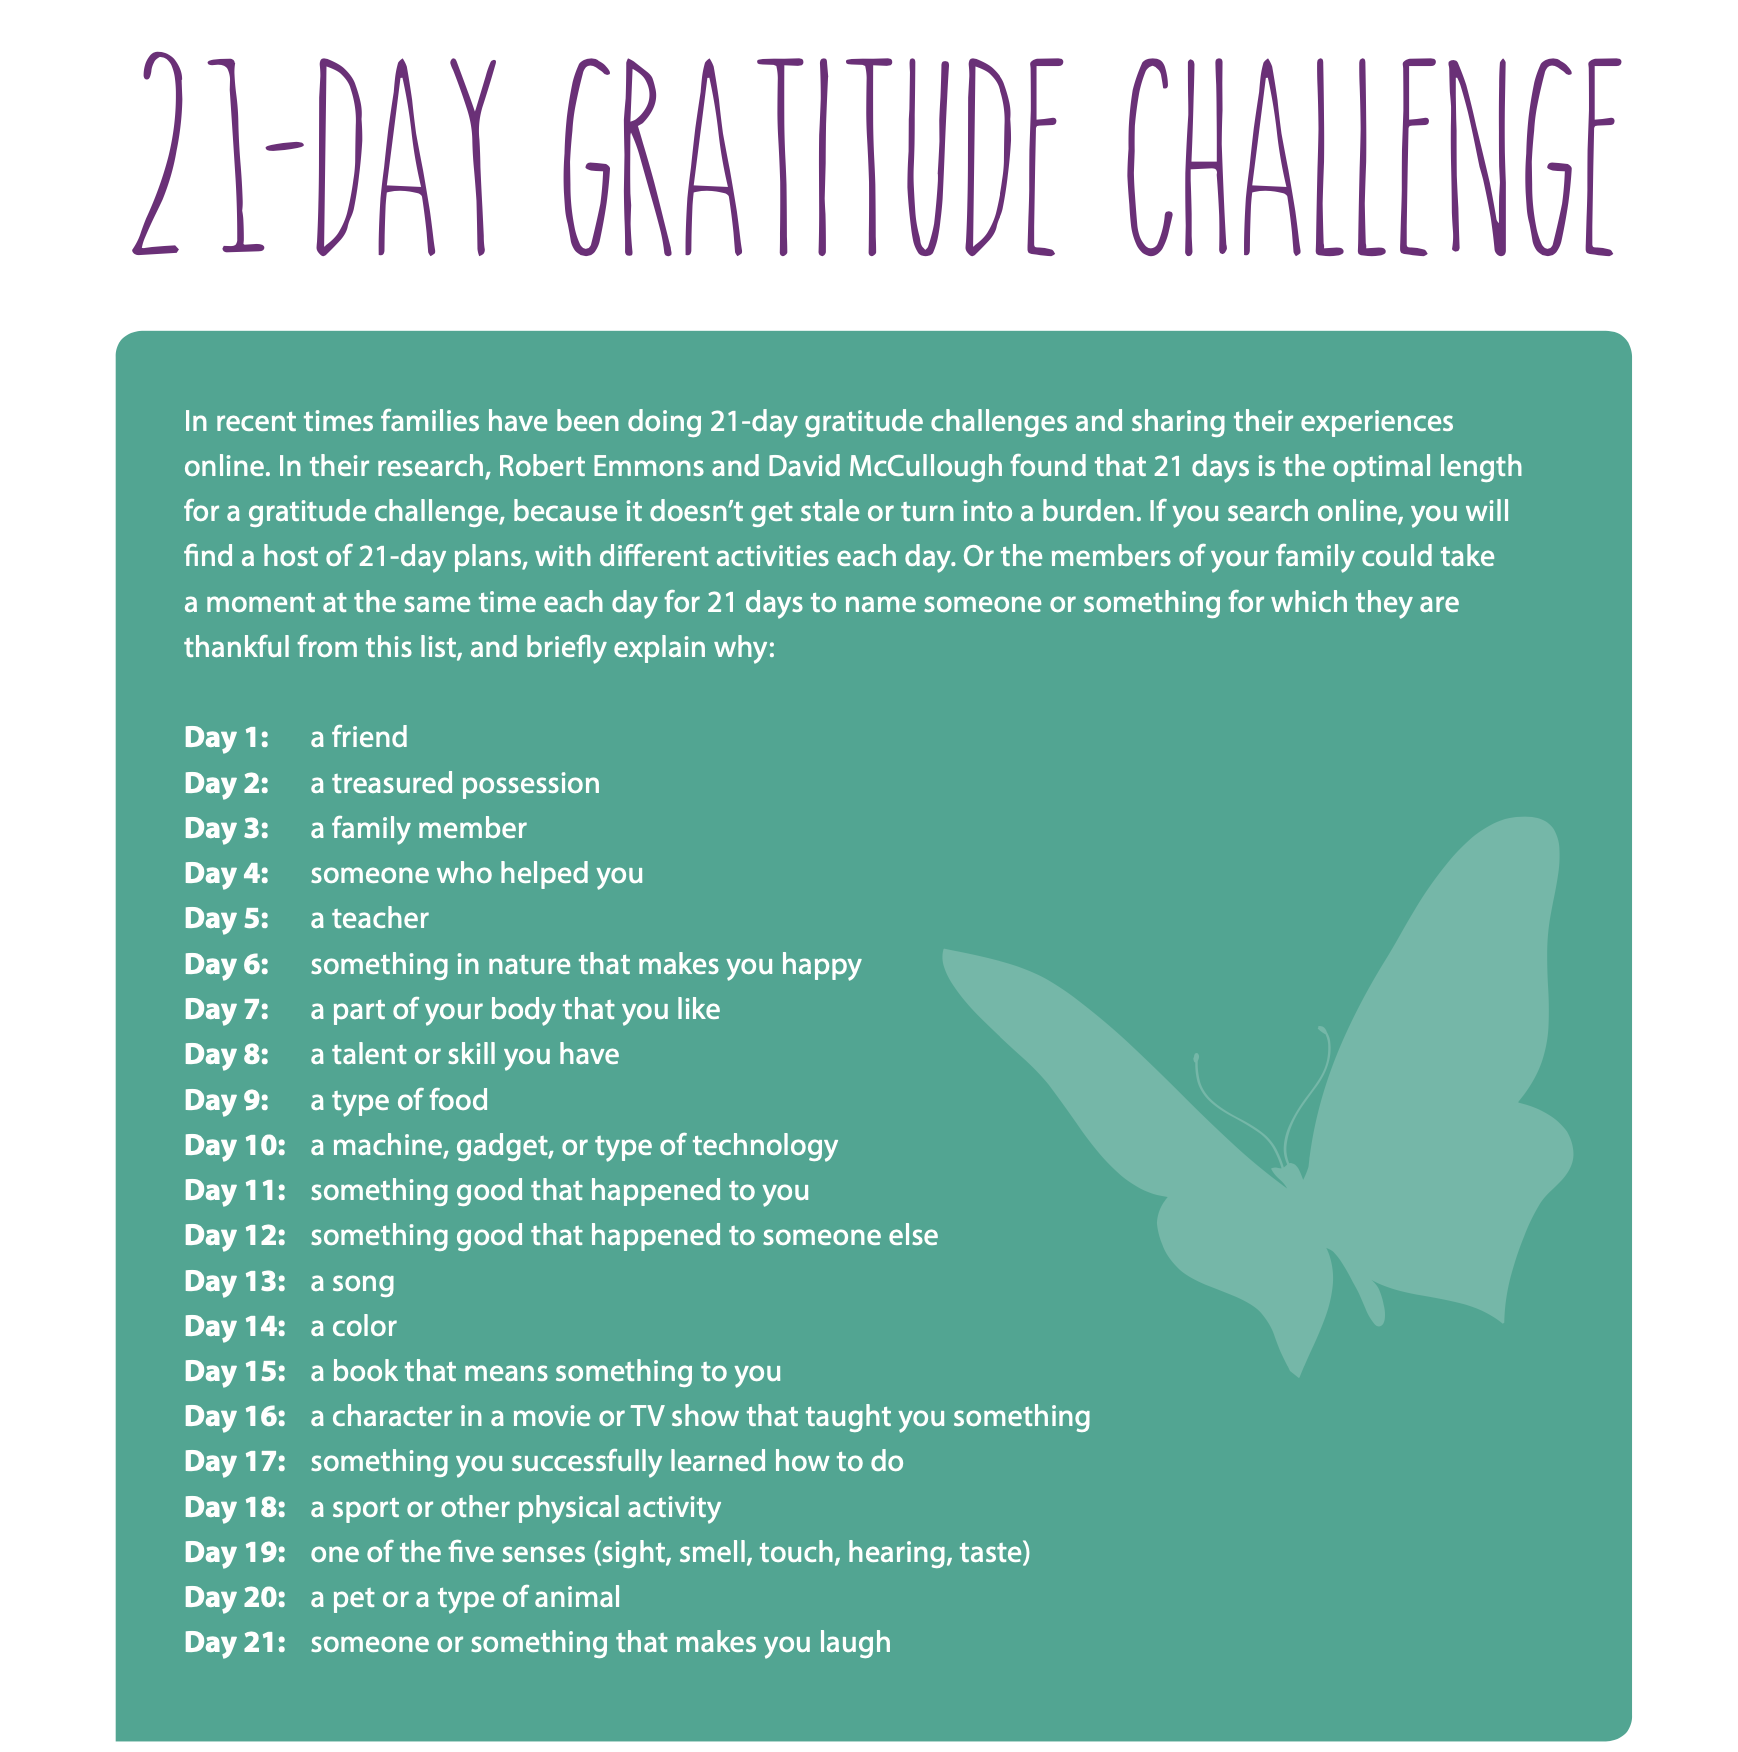 Enlighten Education 21 Day Gratitude Challenge